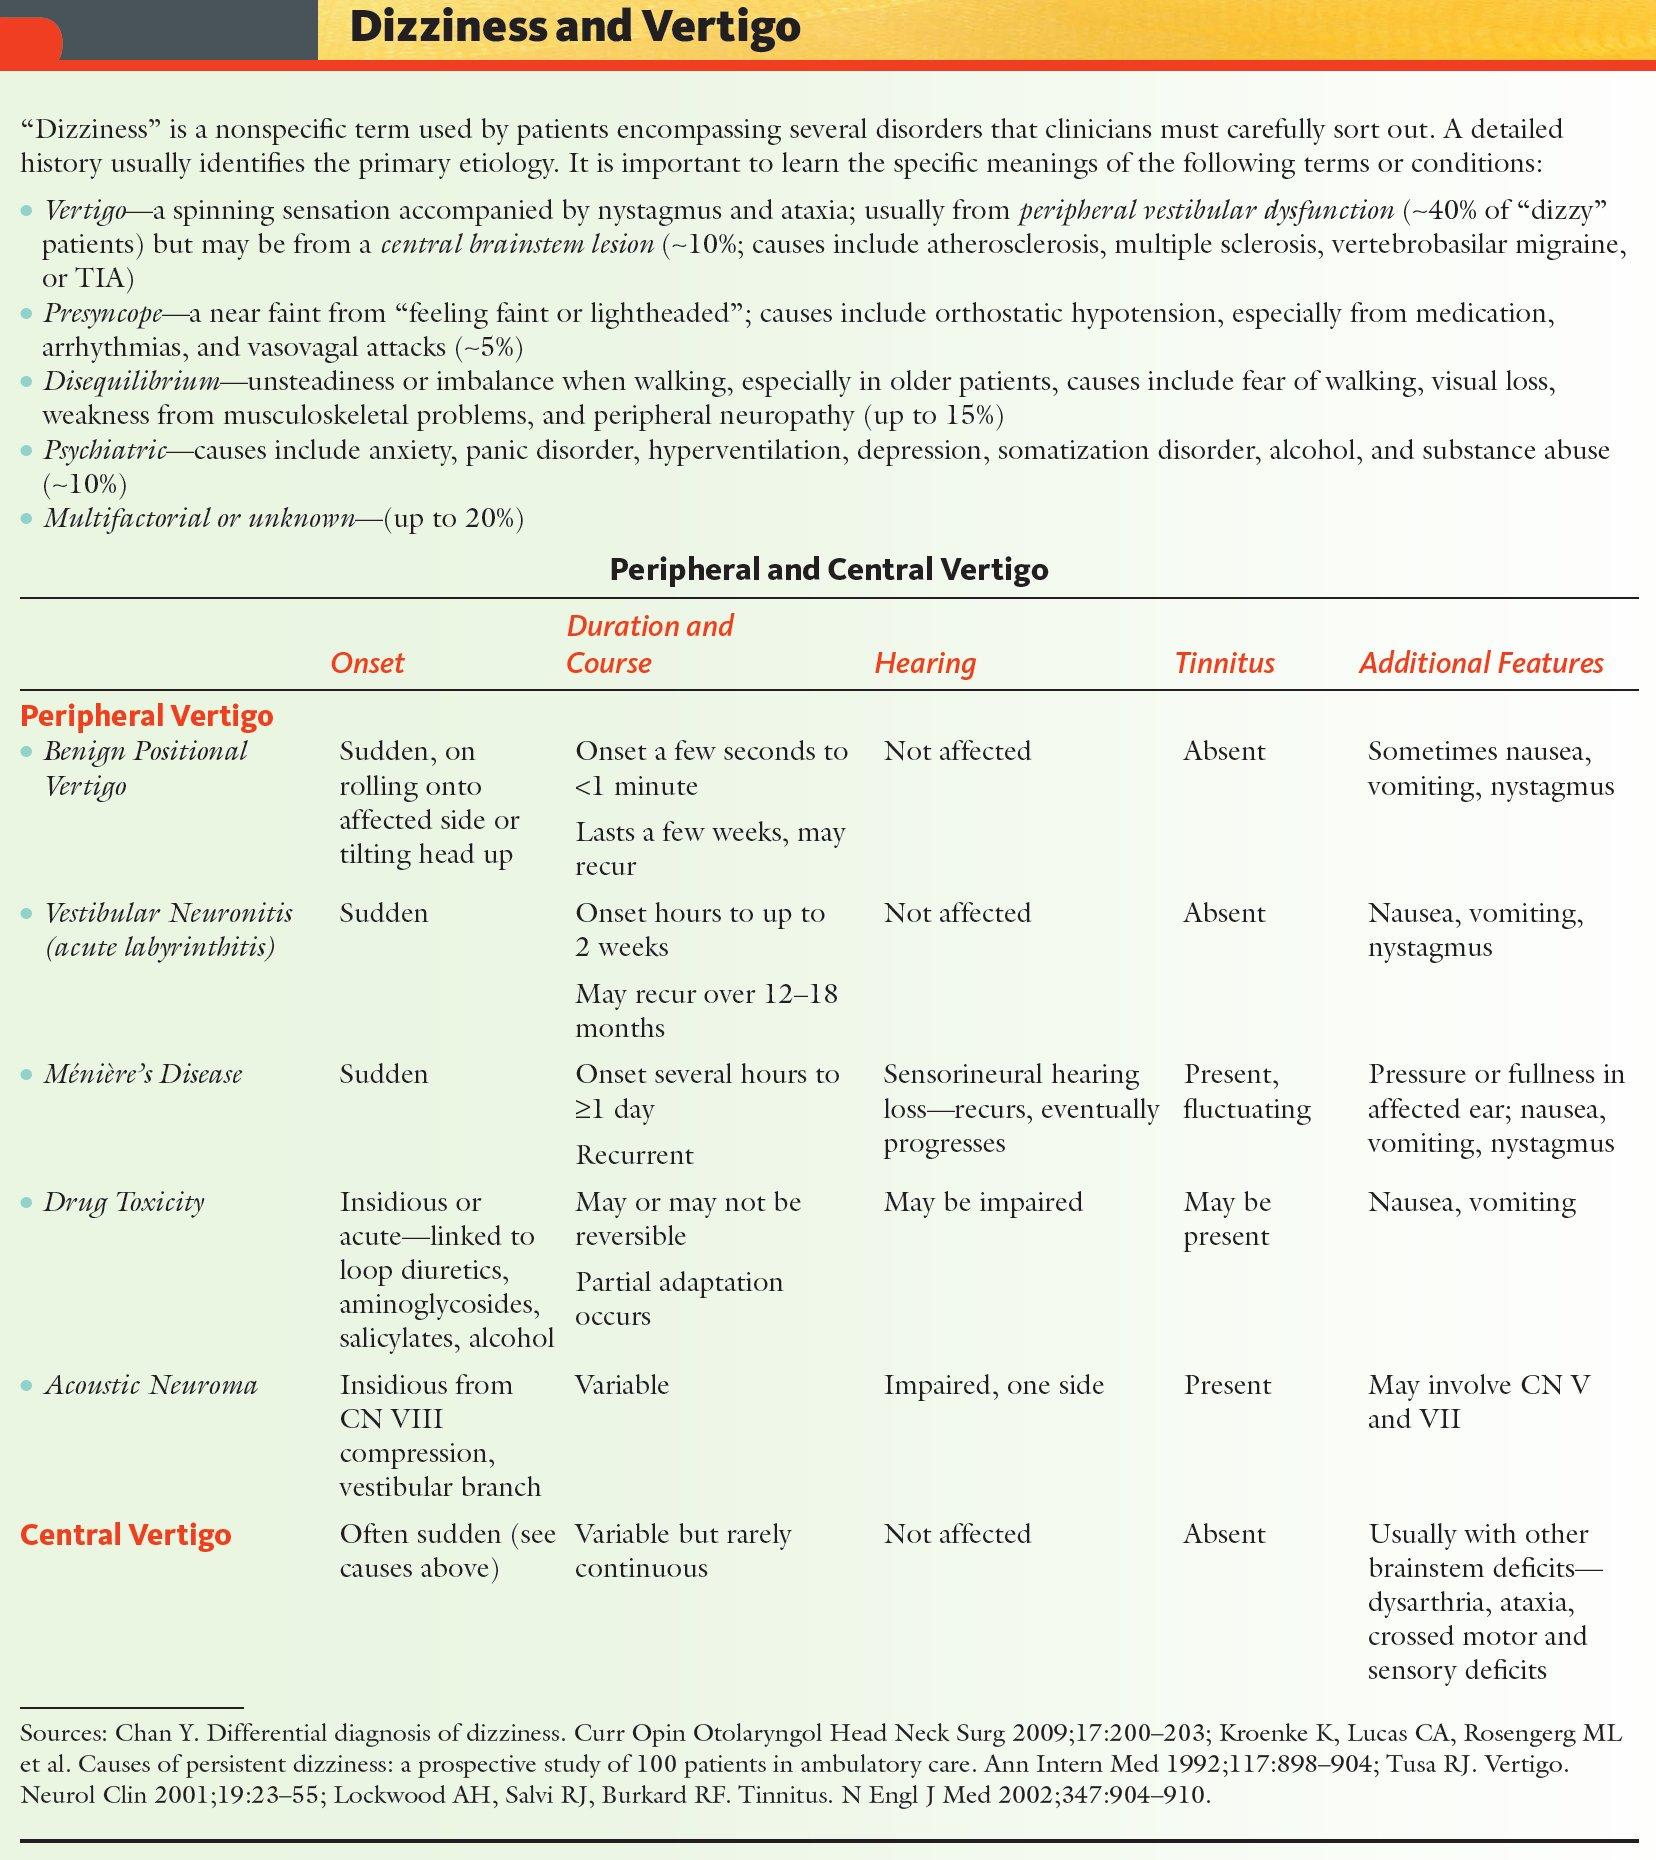 Causes Of Peripheral And Central Vertigo Peripheral Vertigo Benign Positional Vertigo